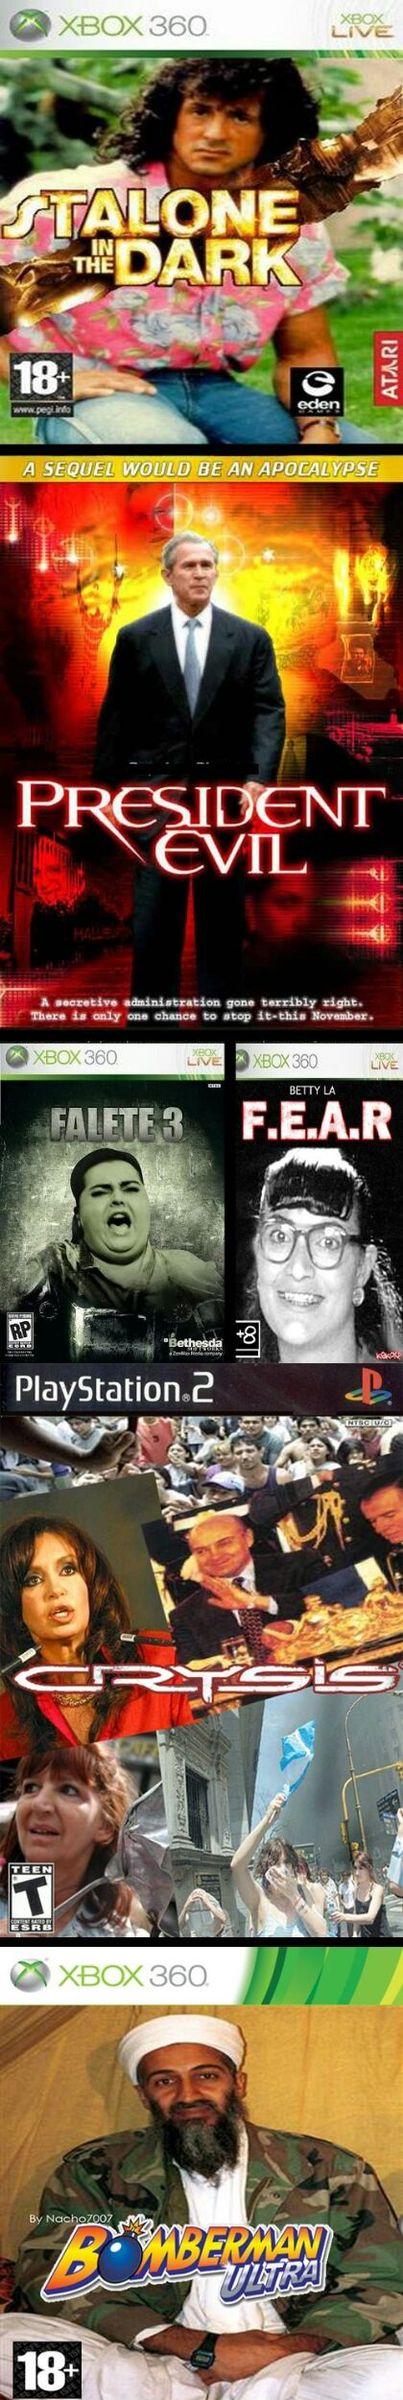 videojuegos vistos de otra manera - meme